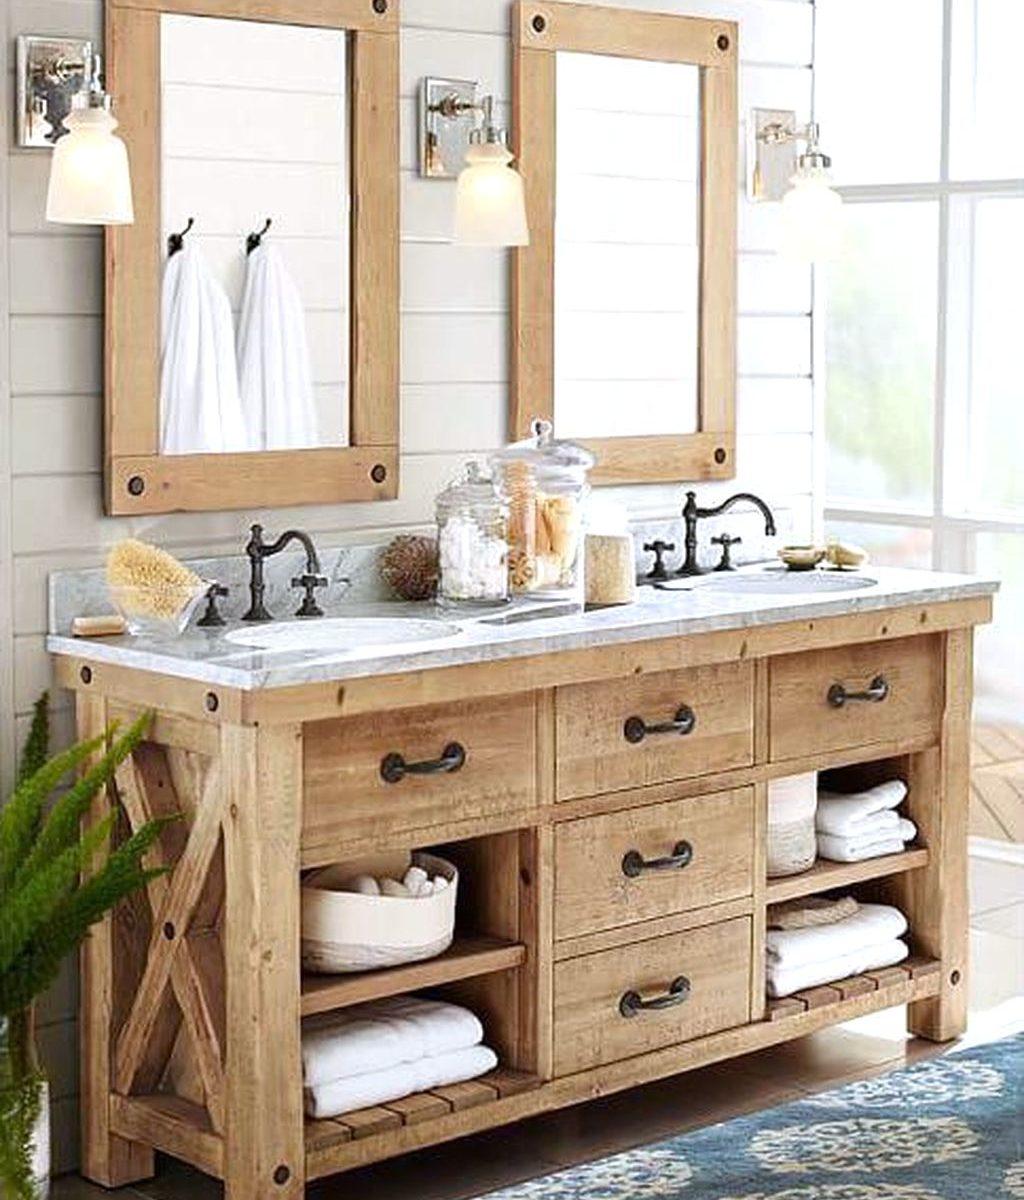 Fabulous Rustic Bathroom Vanities Design Ideas 23